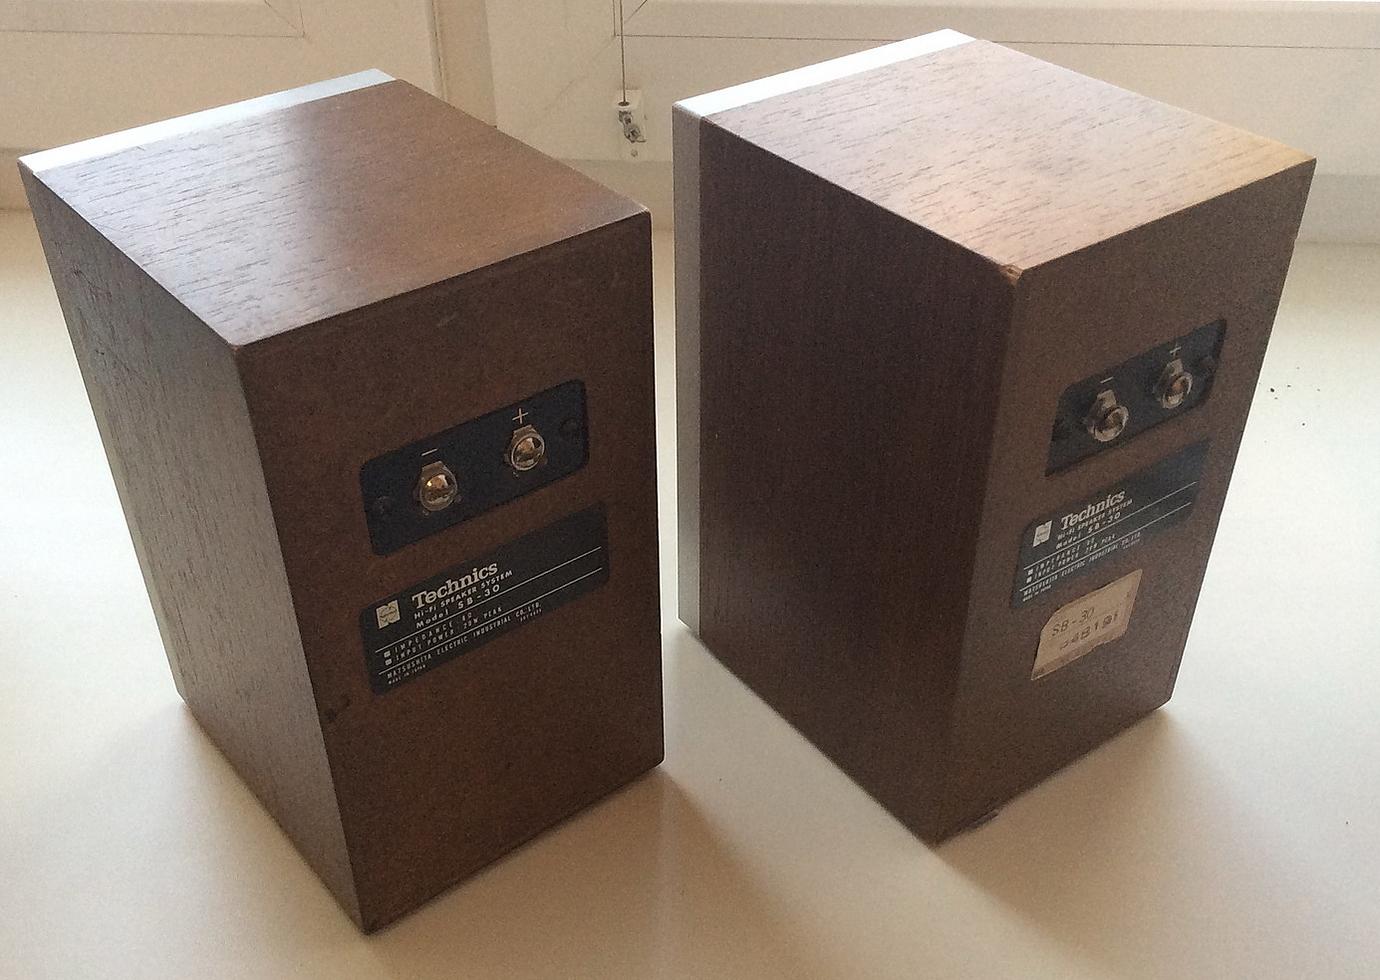 Technics SB 30 миниатюрные полочники - Акустика - DA Stereo